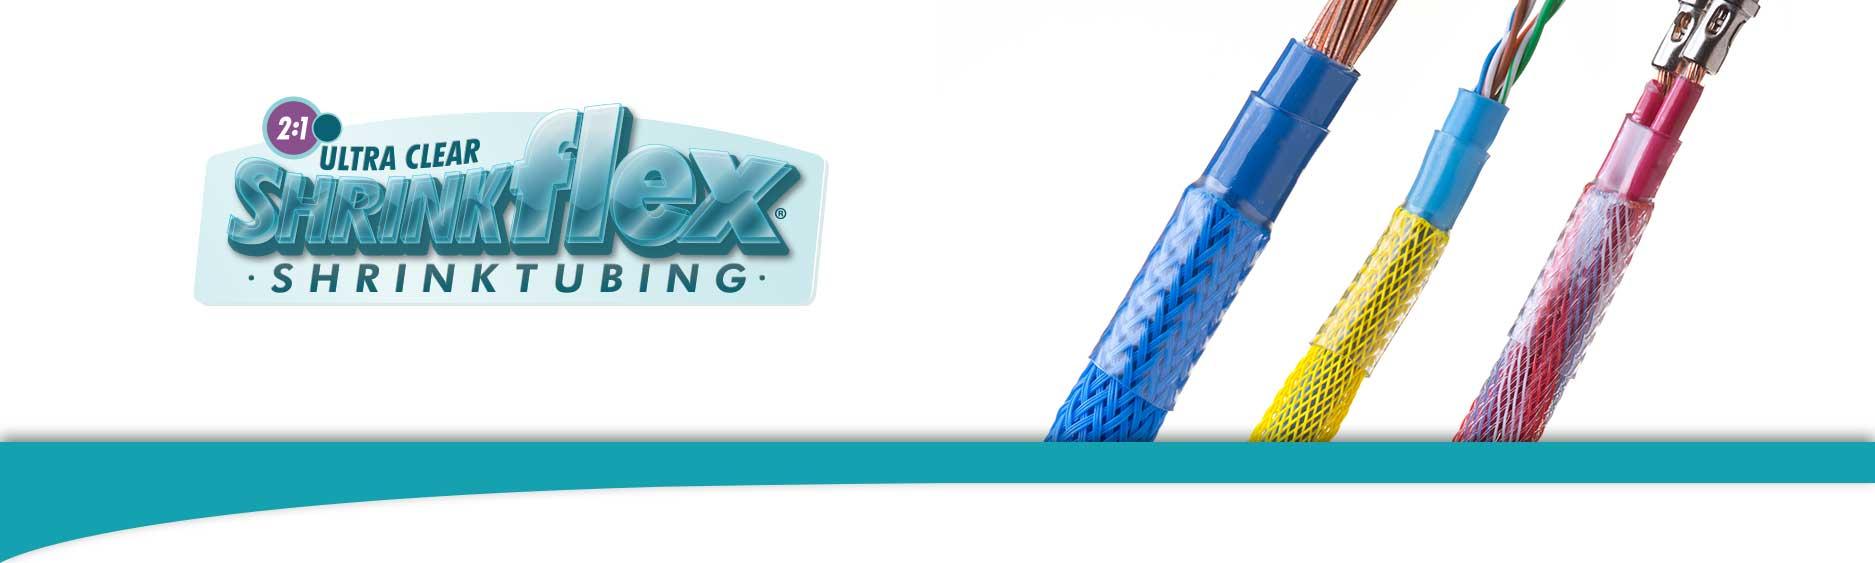 Heatshrink Tubing  2-1  PVC